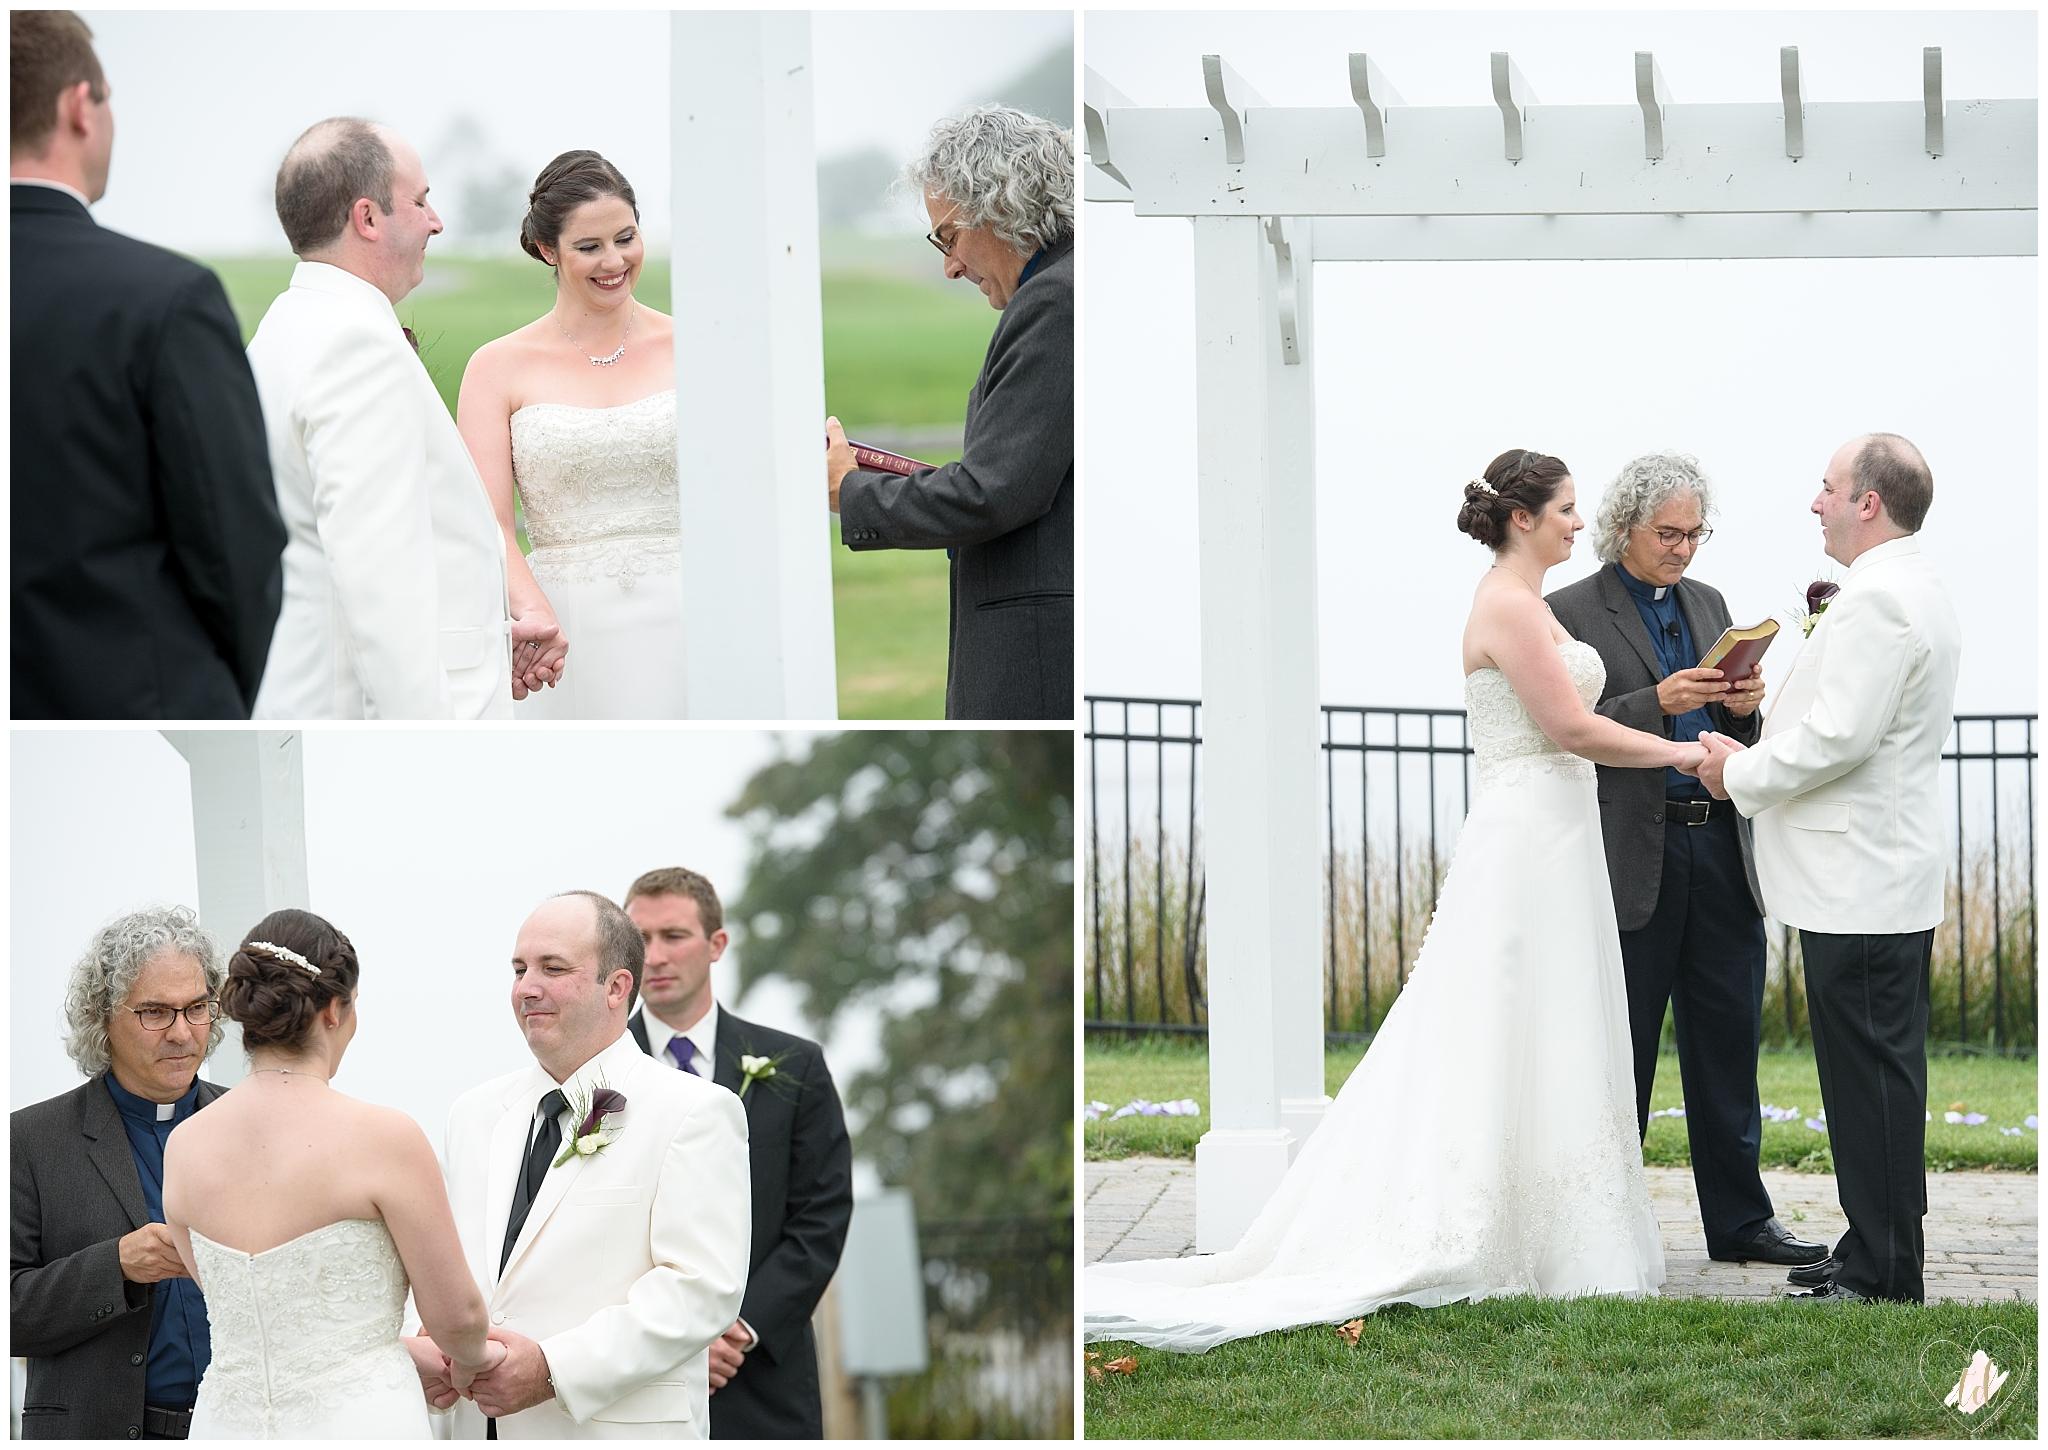 Wedding ceremony at the Samoset Resort in Rockport, Maine